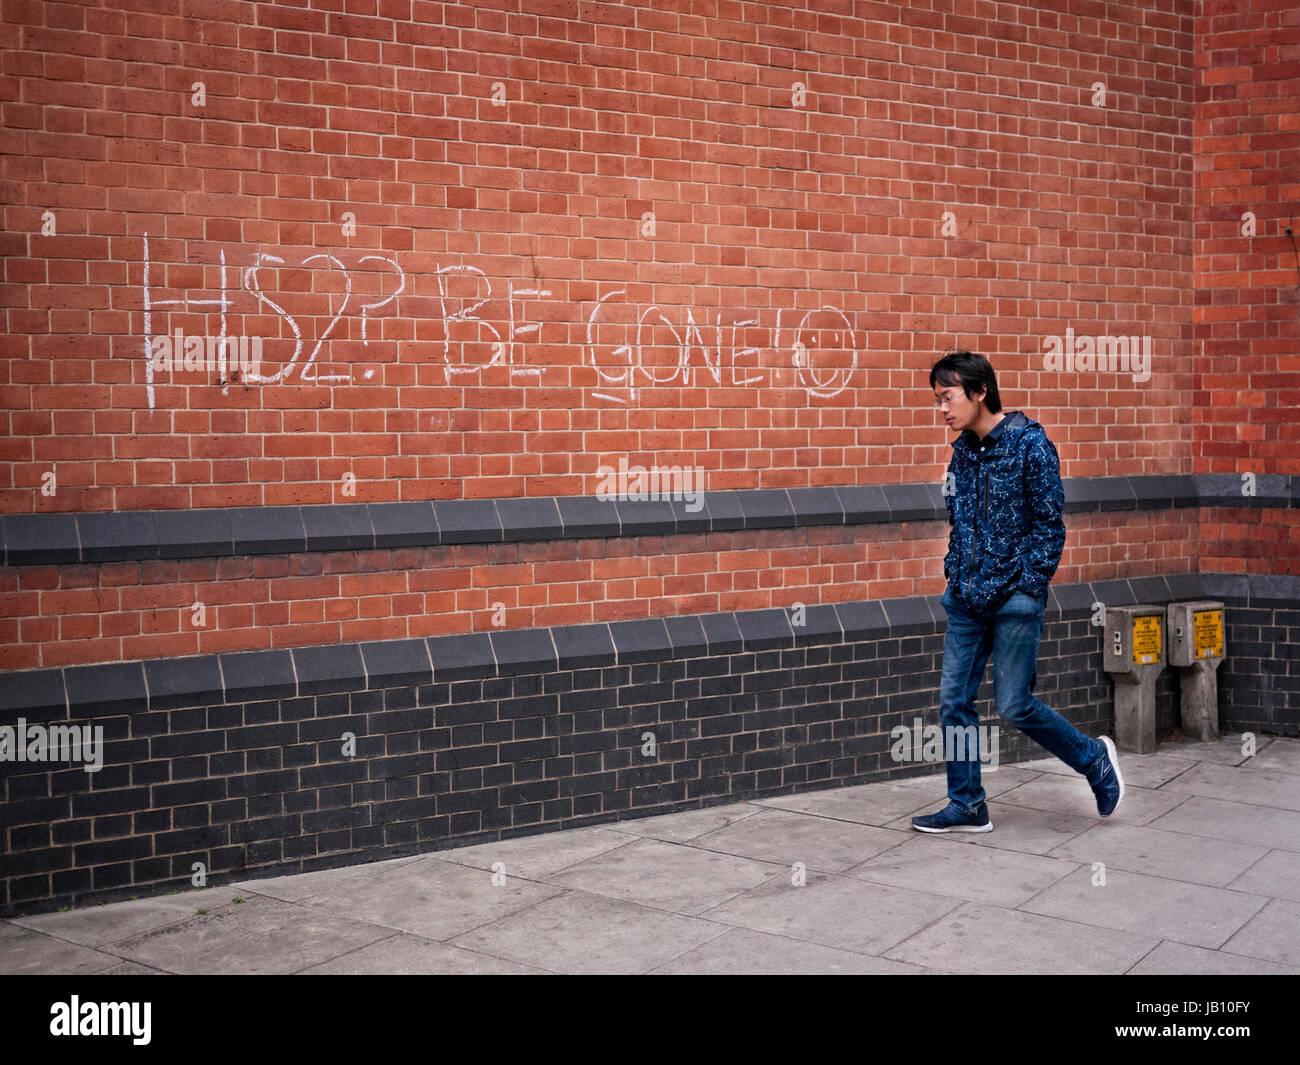 Anti HS2 Graffiti on a wall close to Euston station in Camden London UK Stock Photo